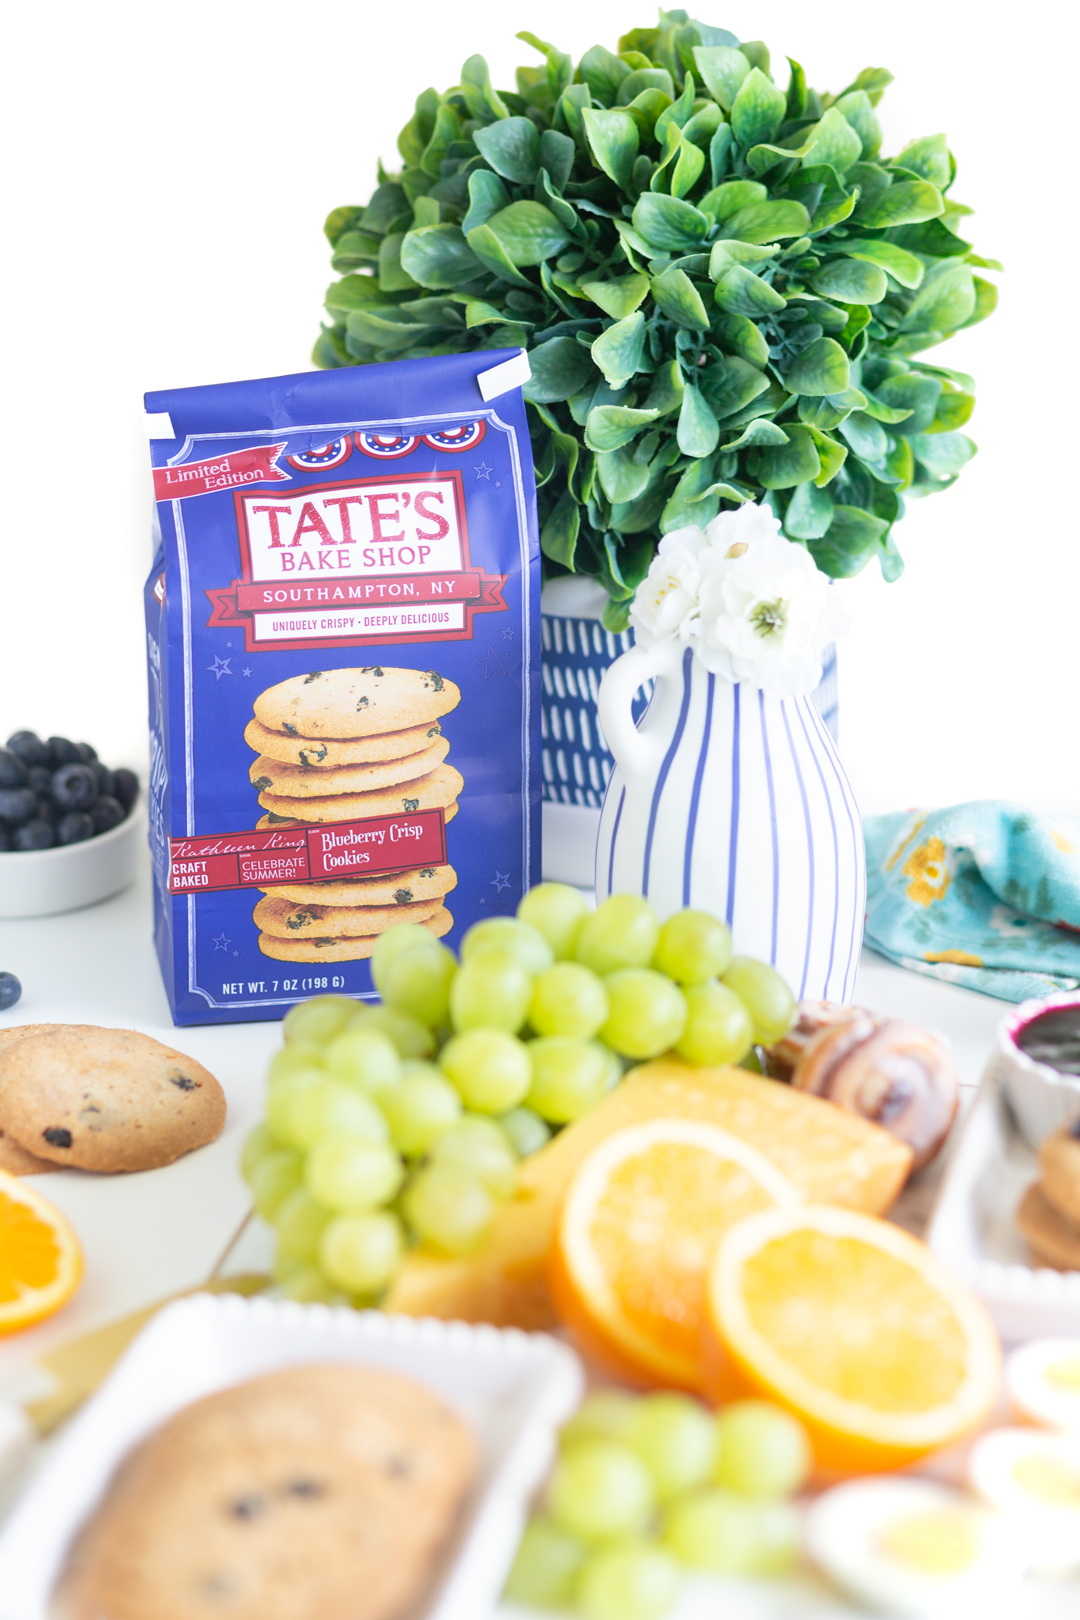 Tate's Bake Shop Blueberry Crisp package